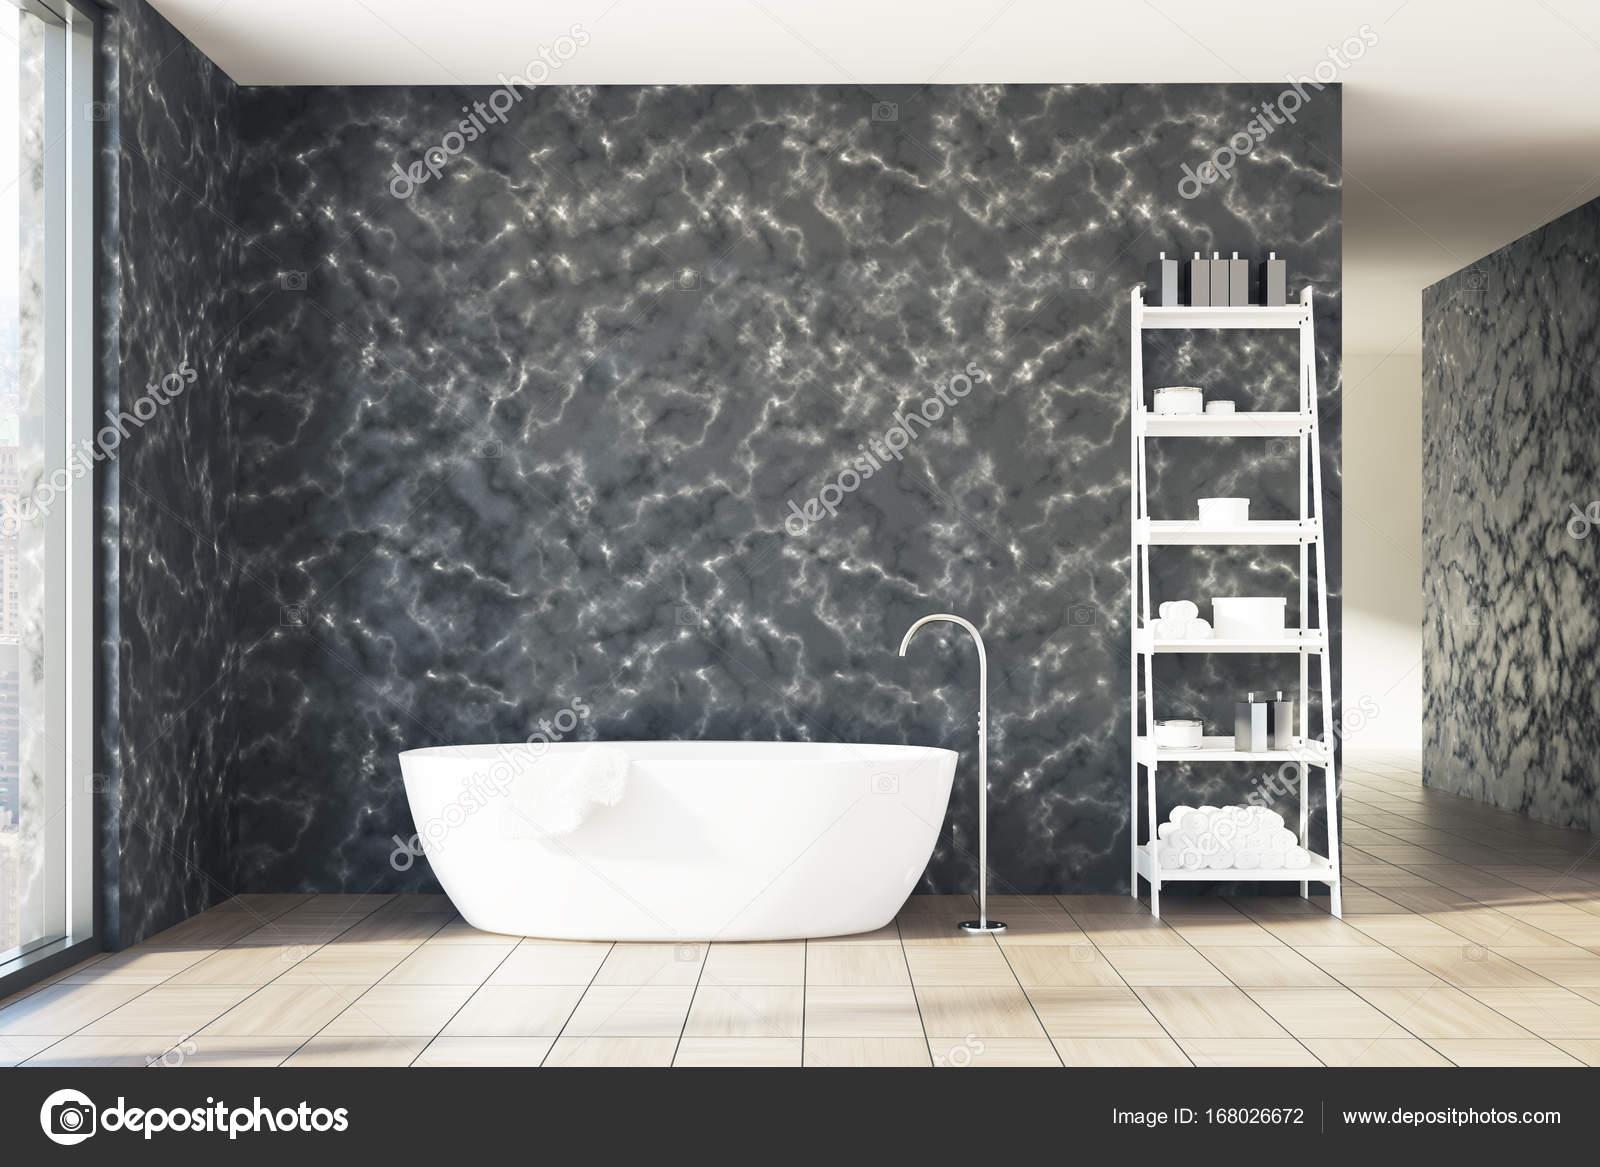 Vasca Da Bagno Marmo : Vasca da bagno in marmo bianco ripiani u foto stock